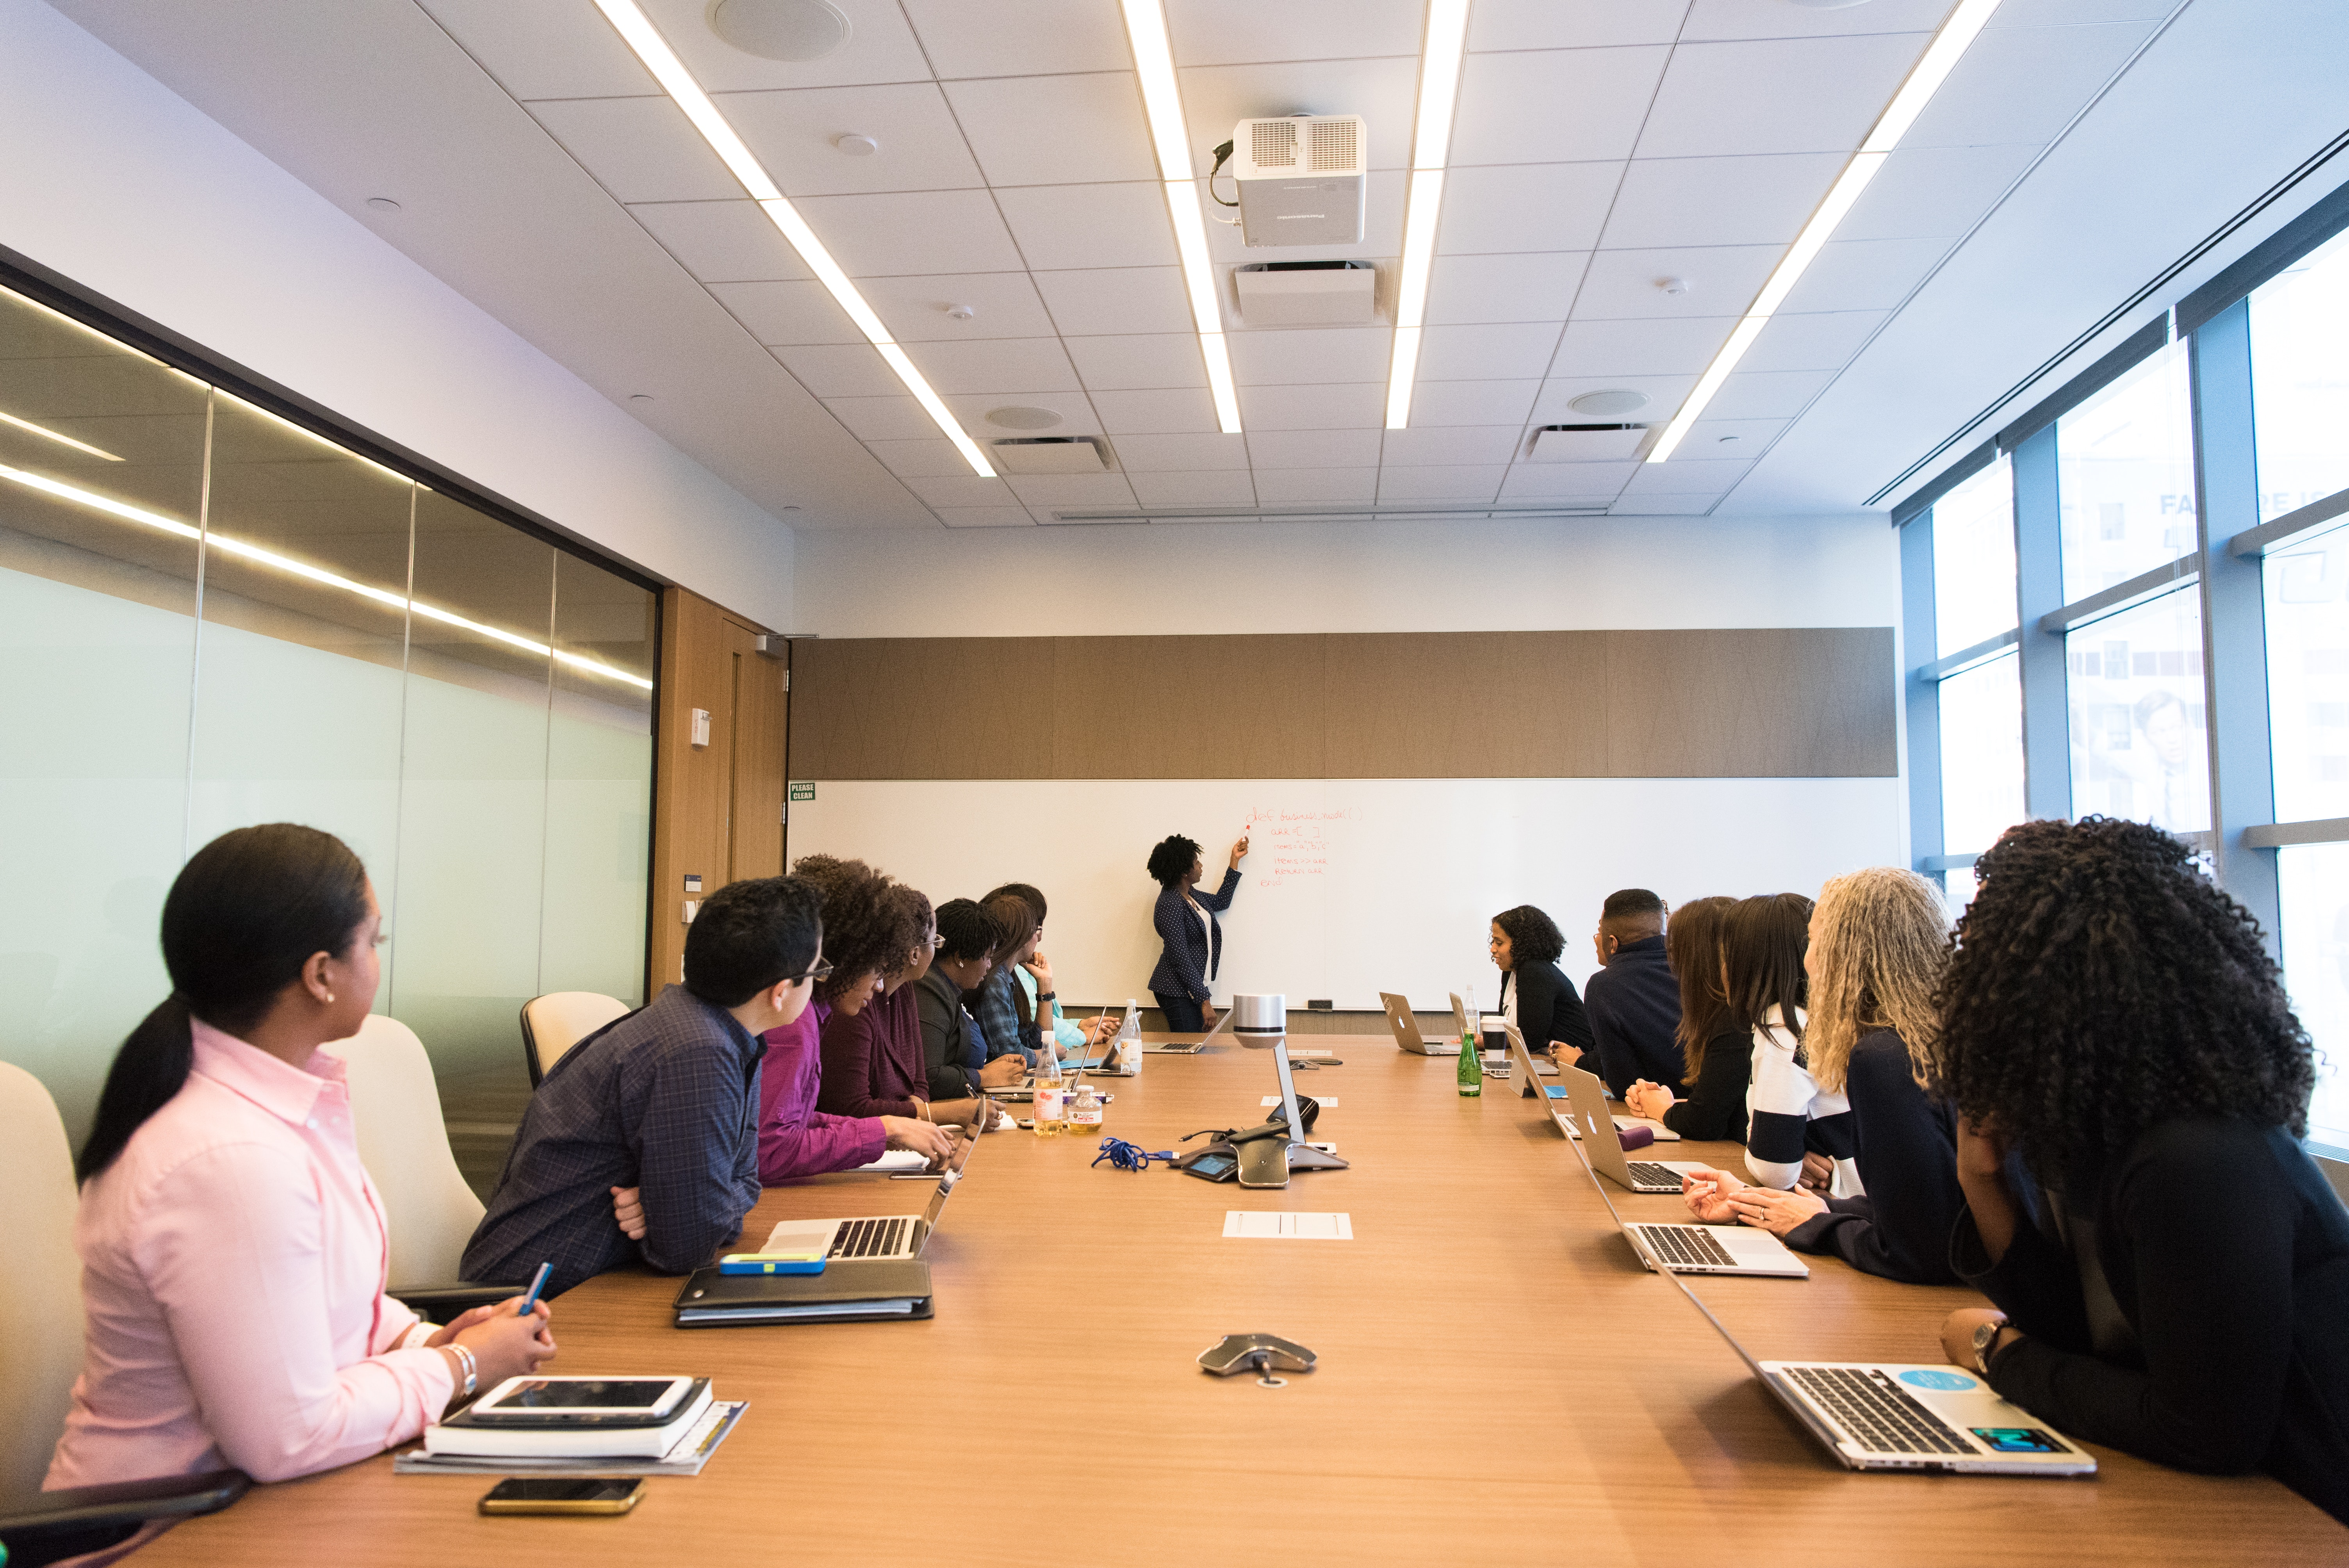 Boardroom Conference Conference Room 1181396 / Pexels.com